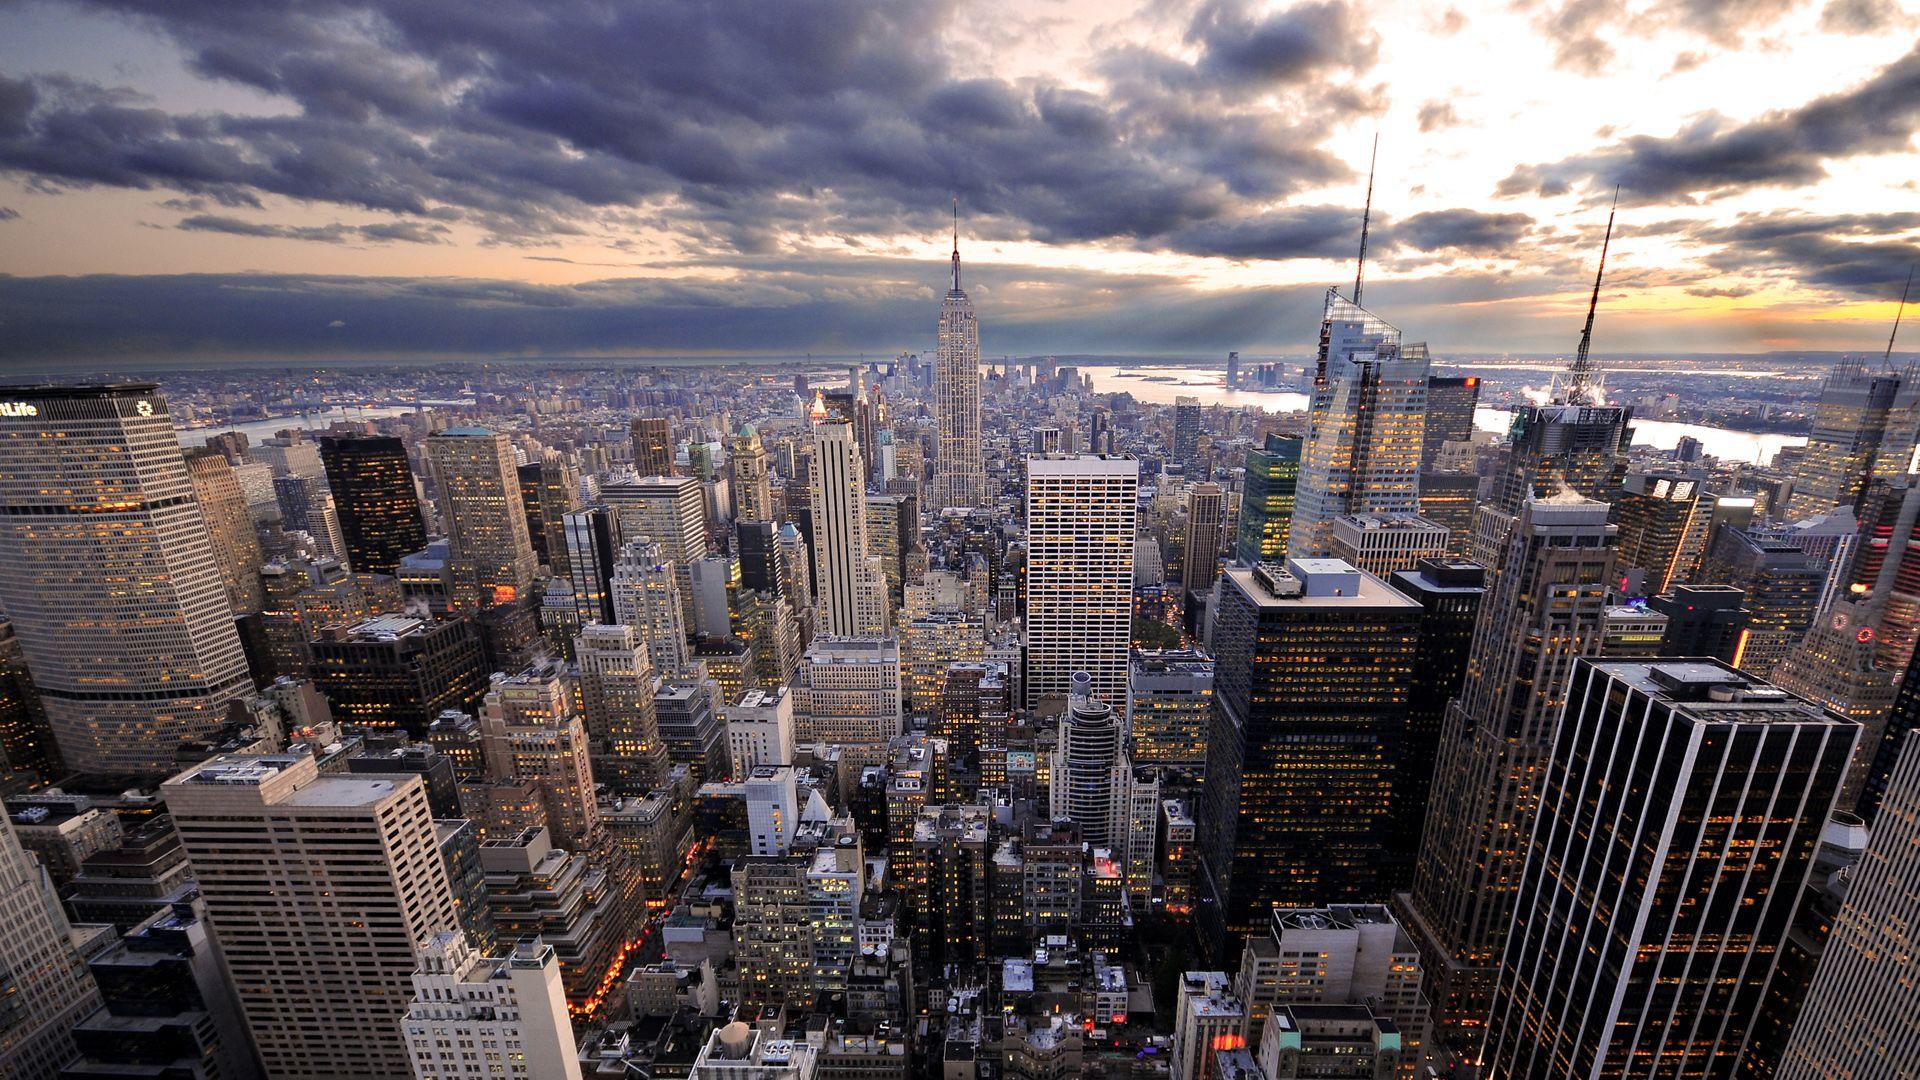 New York City Photos HD Wallpaper New York City Photos 1920x1080